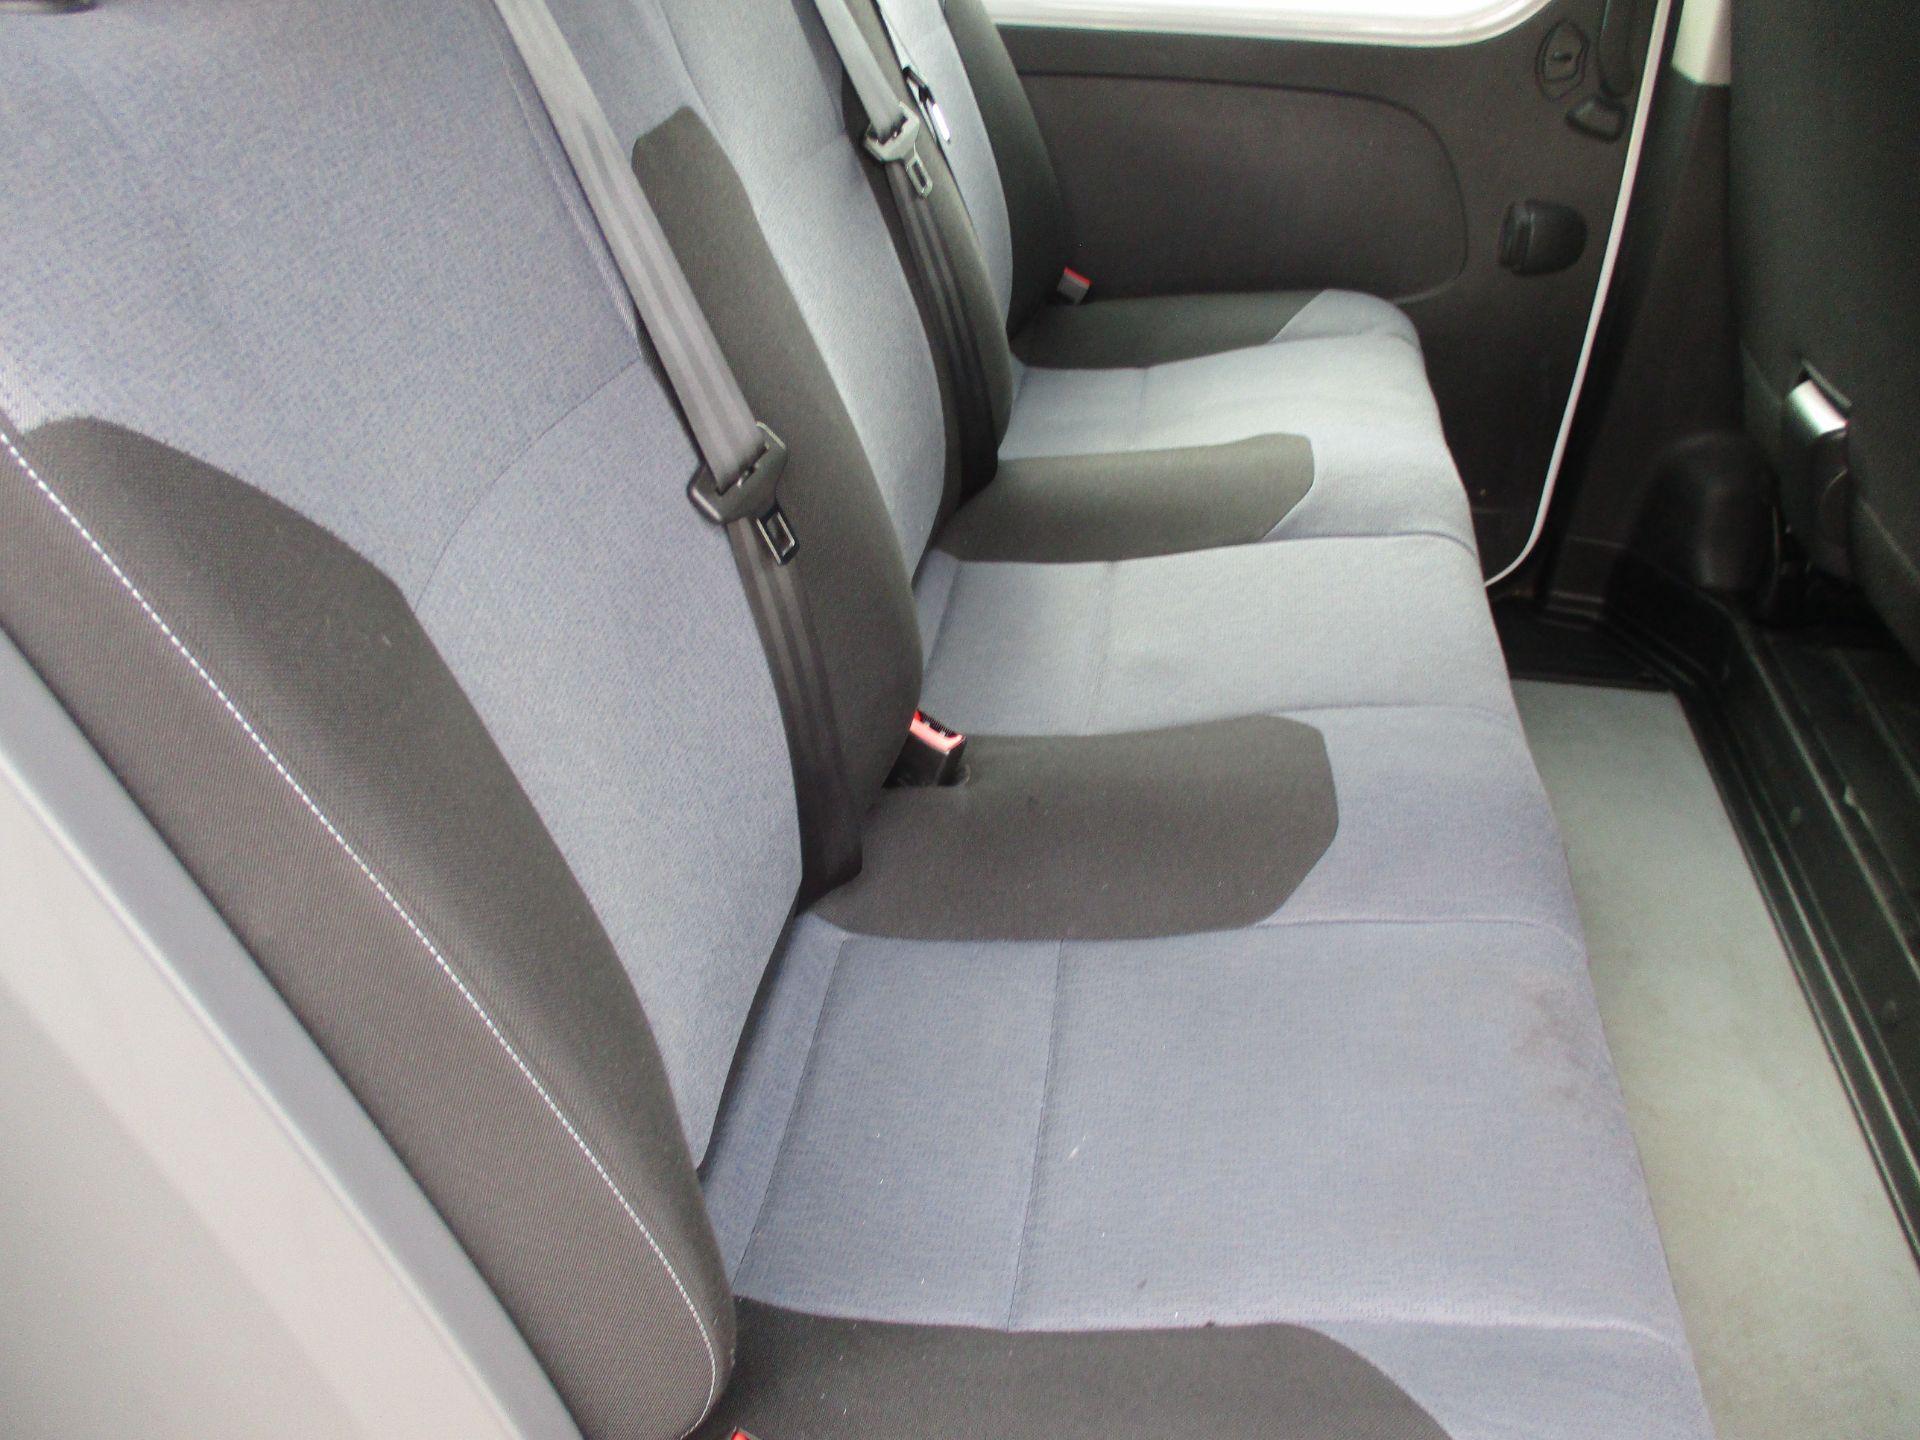 2017 Vauxhall Vivaro L2 H1 2900 1.6CDTI 120PS DOUBLE CAB  EURO 6 (DY67MYF) Image 25